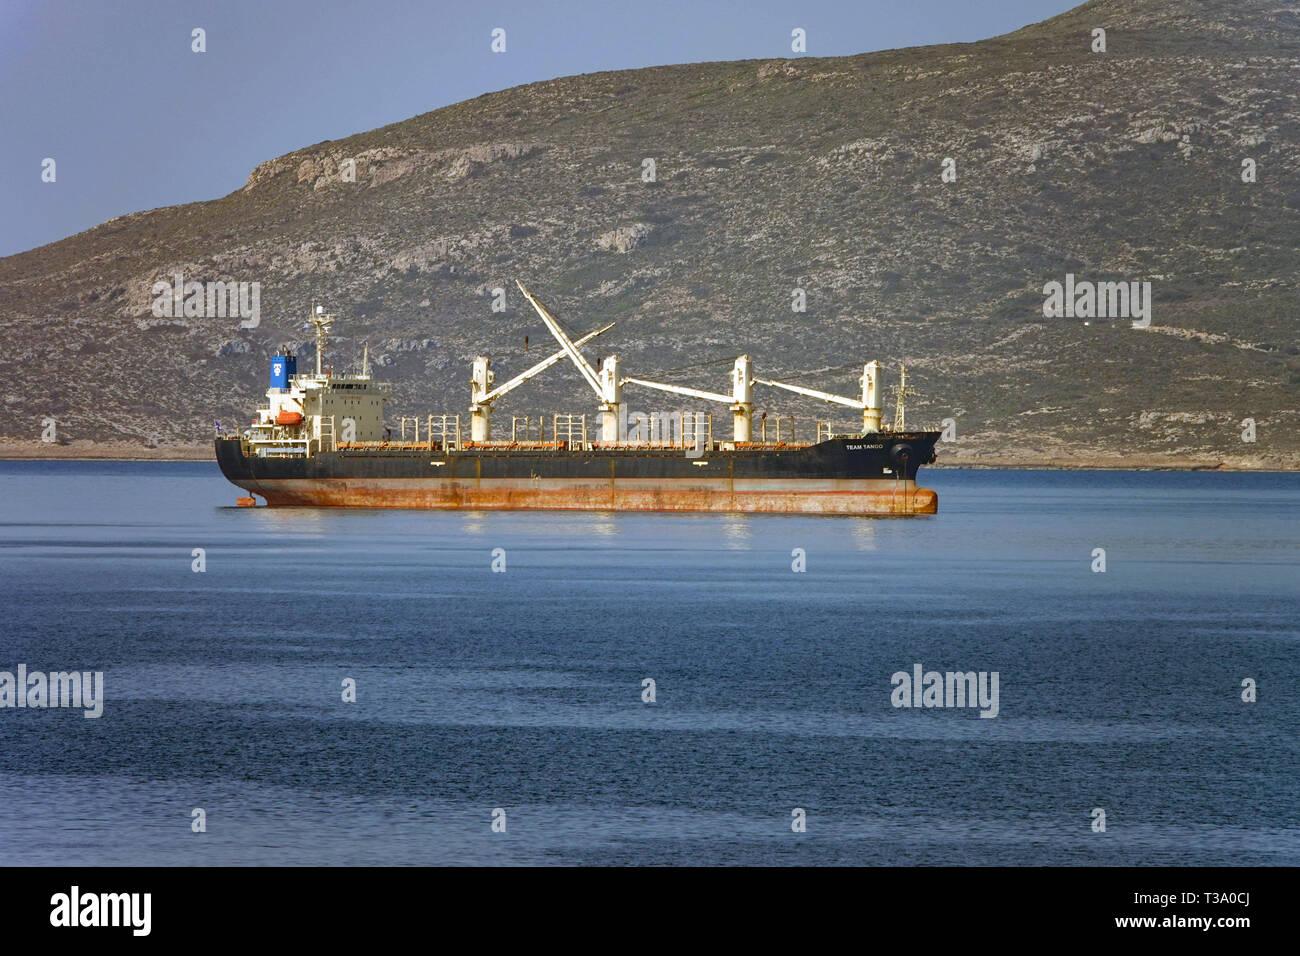 Aegean Bulk Stock Photos & Aegean Bulk Stock Images - Alamy